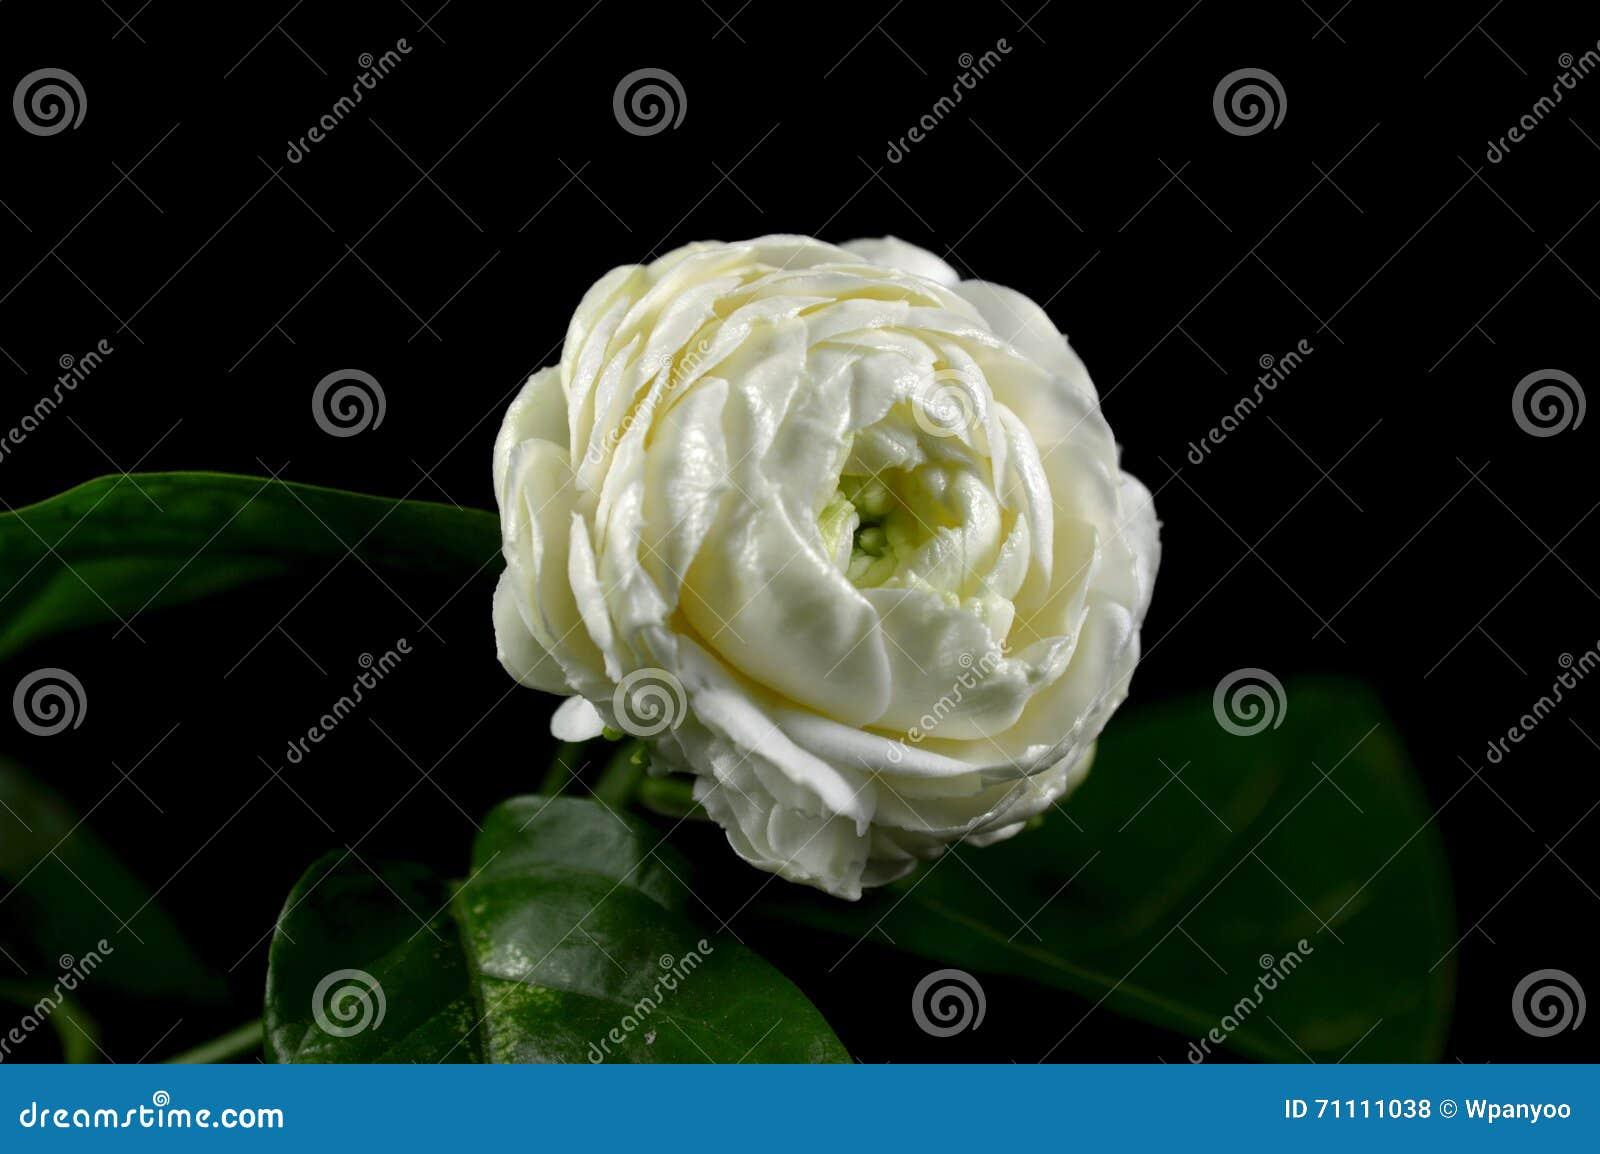 Jasmine flower stock photo image of central subtropical 71111038 jasmine flower izmirmasajfo Gallery